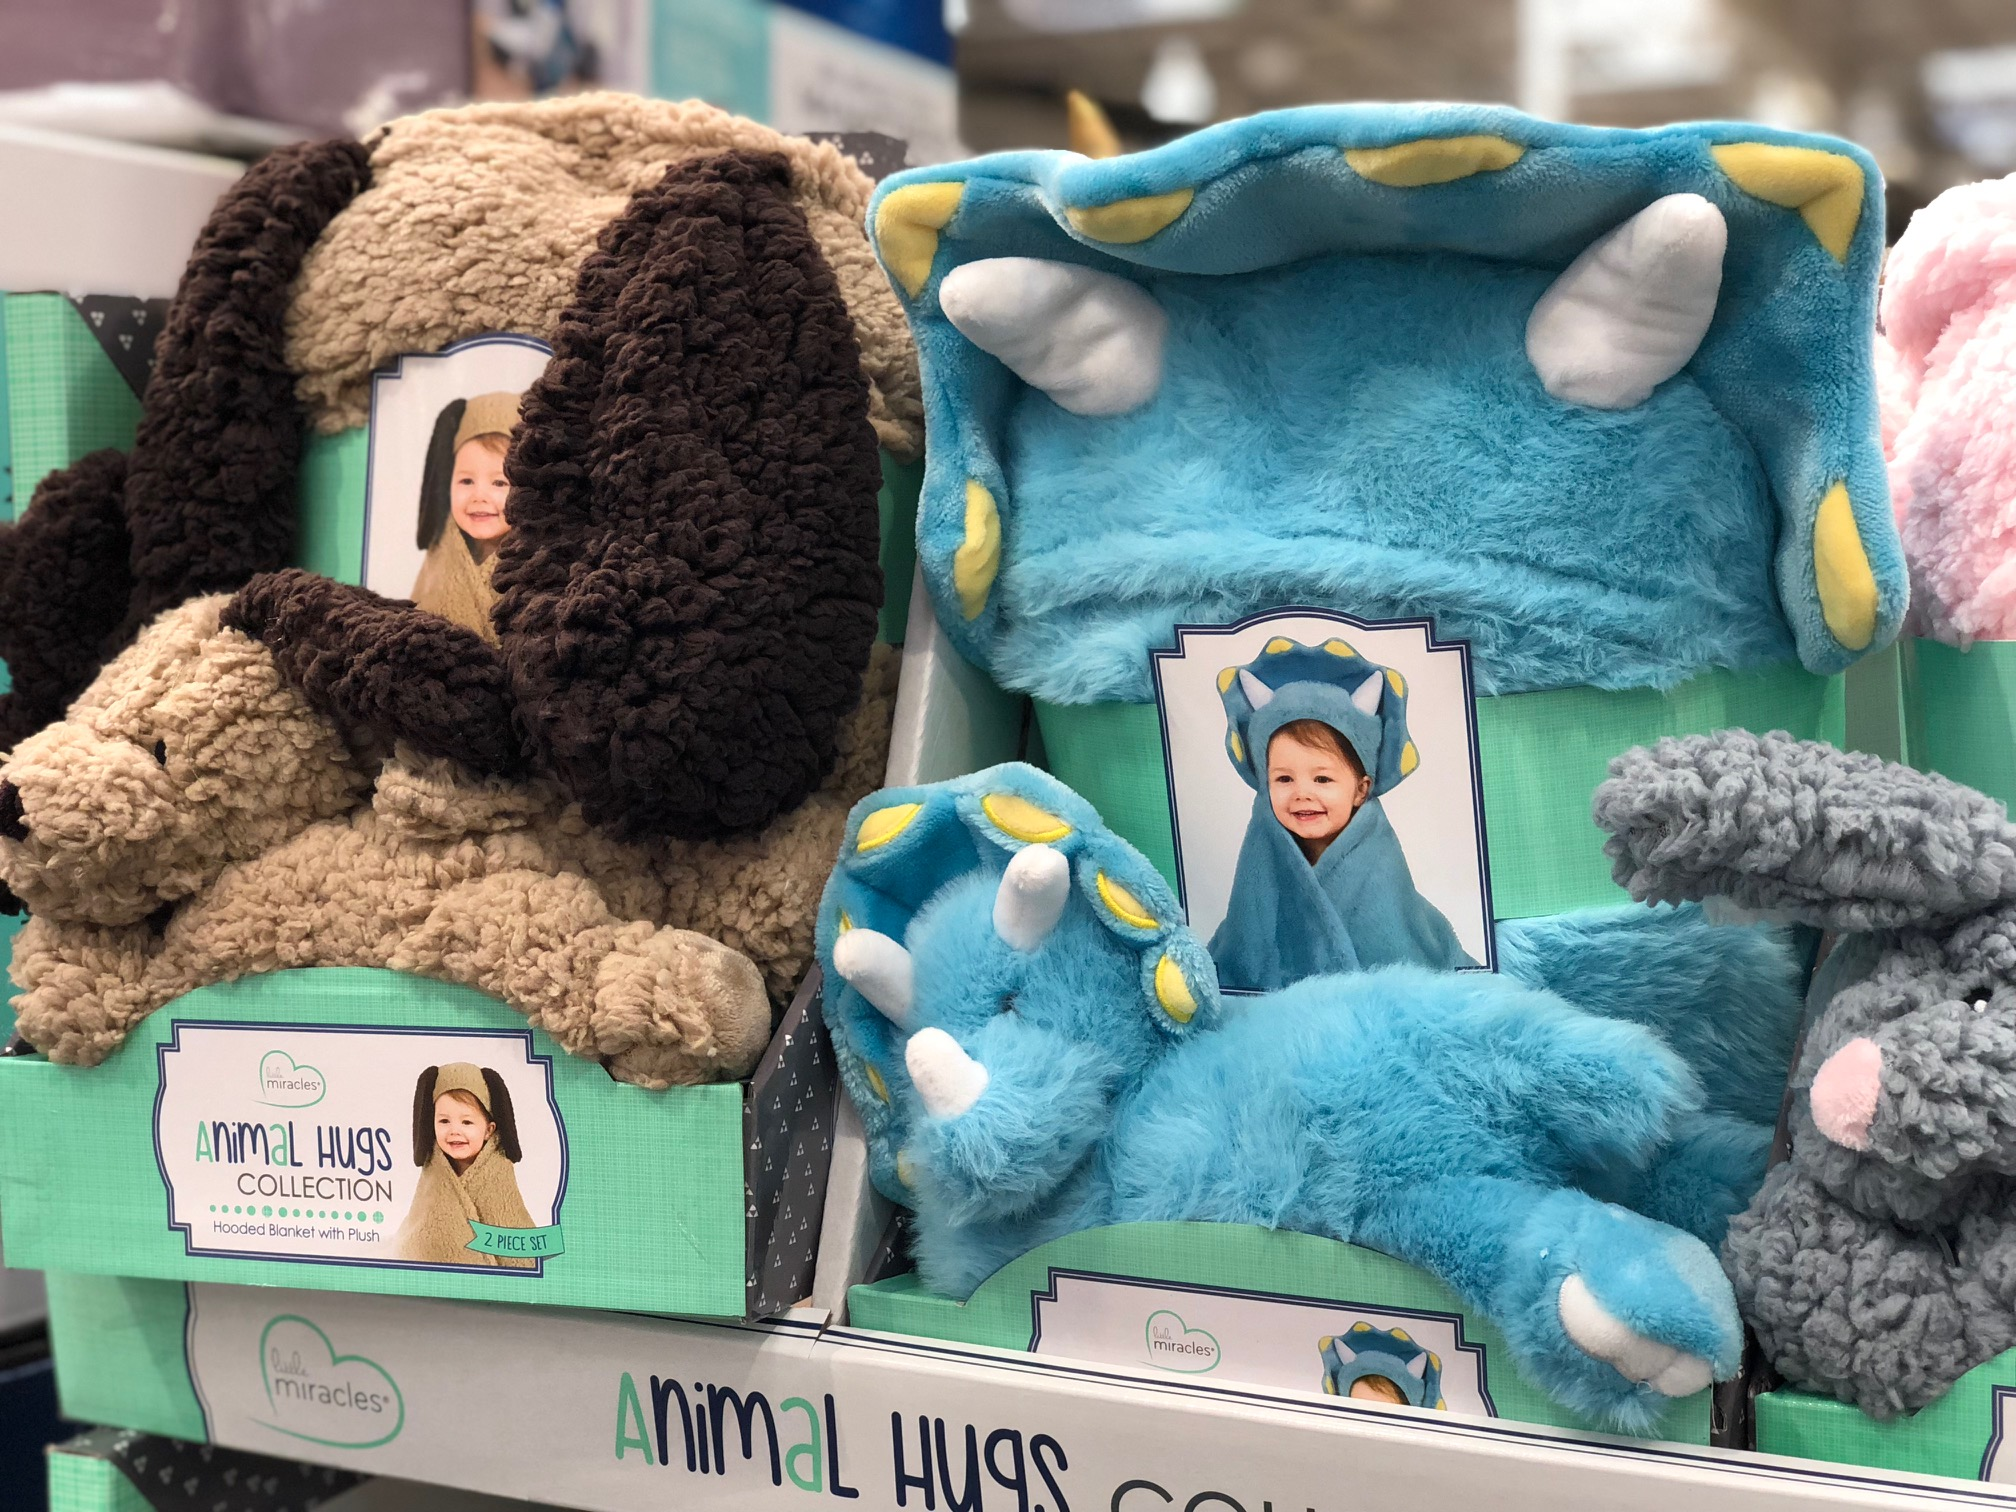 Animal Hugs Hooded Blanket & Plush Toy Set Only $13 99 at